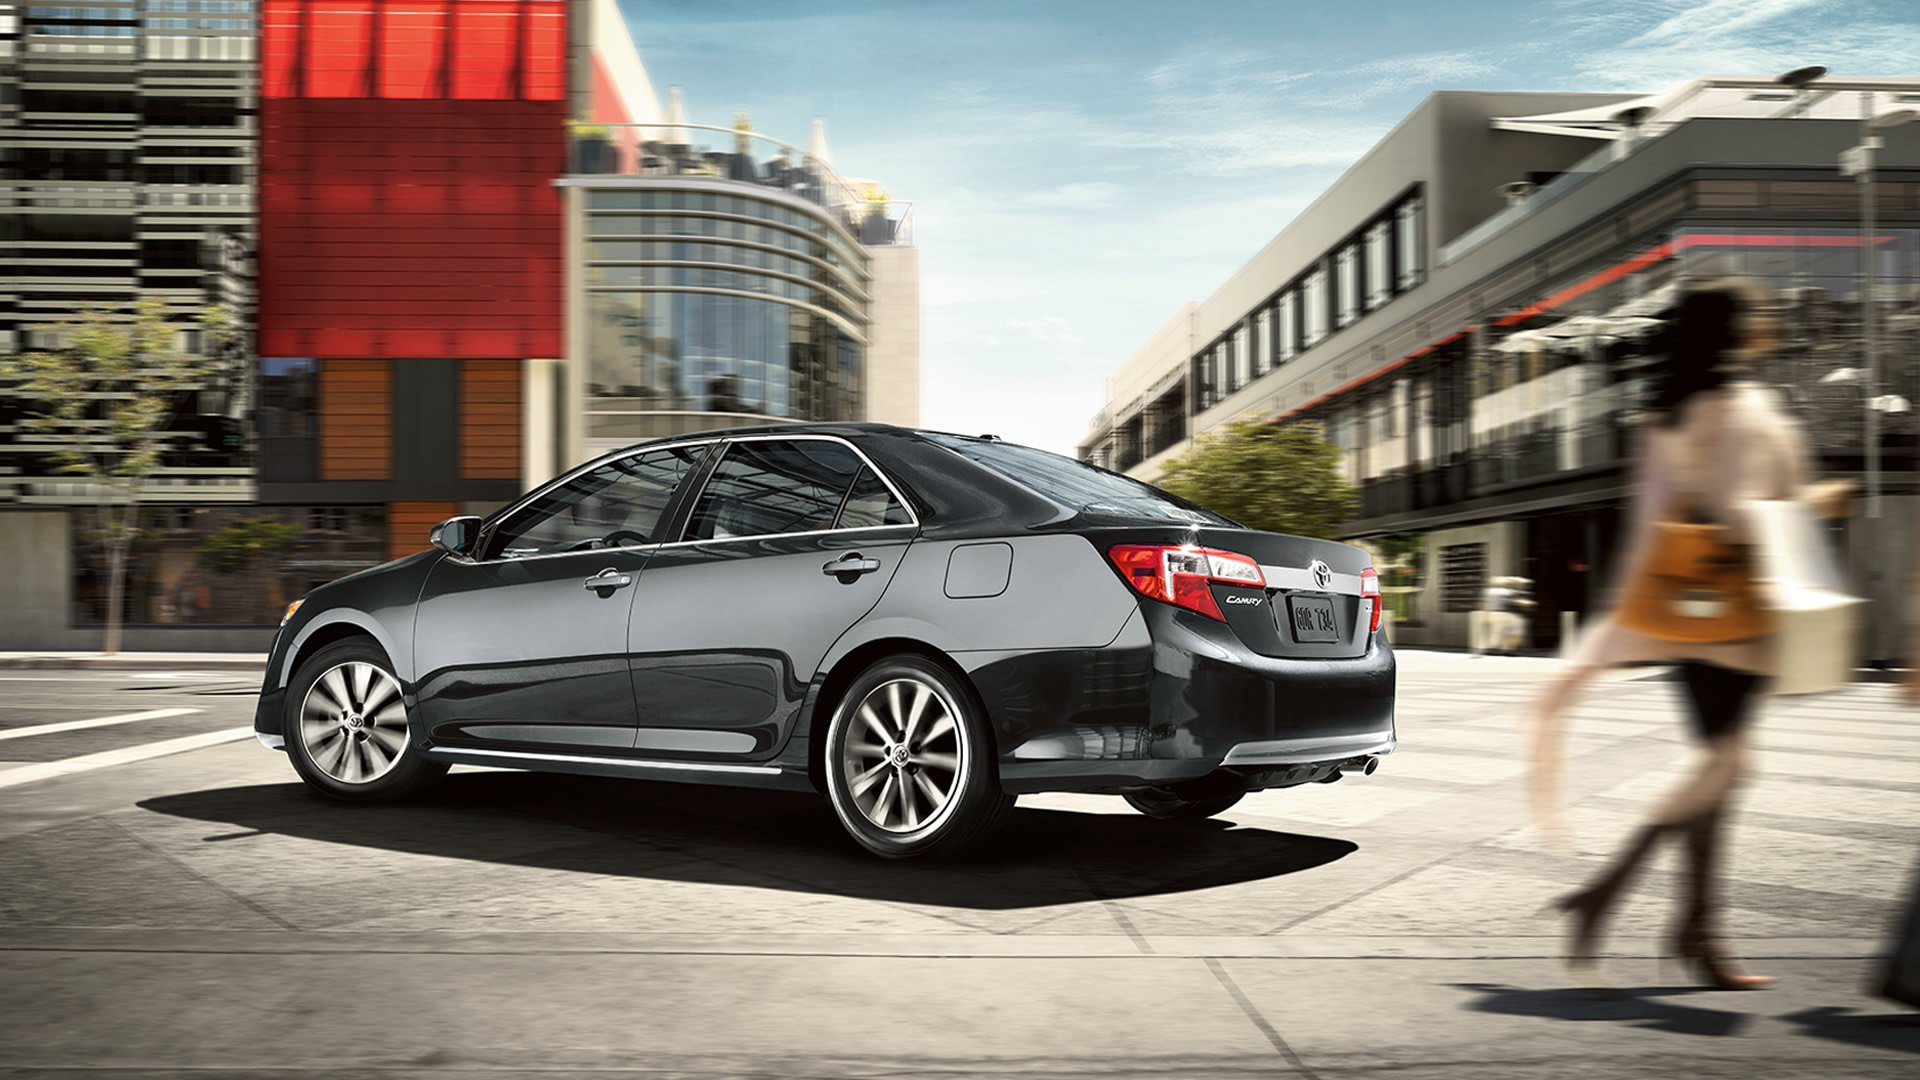 Toyota Dealer Serving Cedar Rapids IA Sales Lease Specials - Where is the nearest toyota dealership